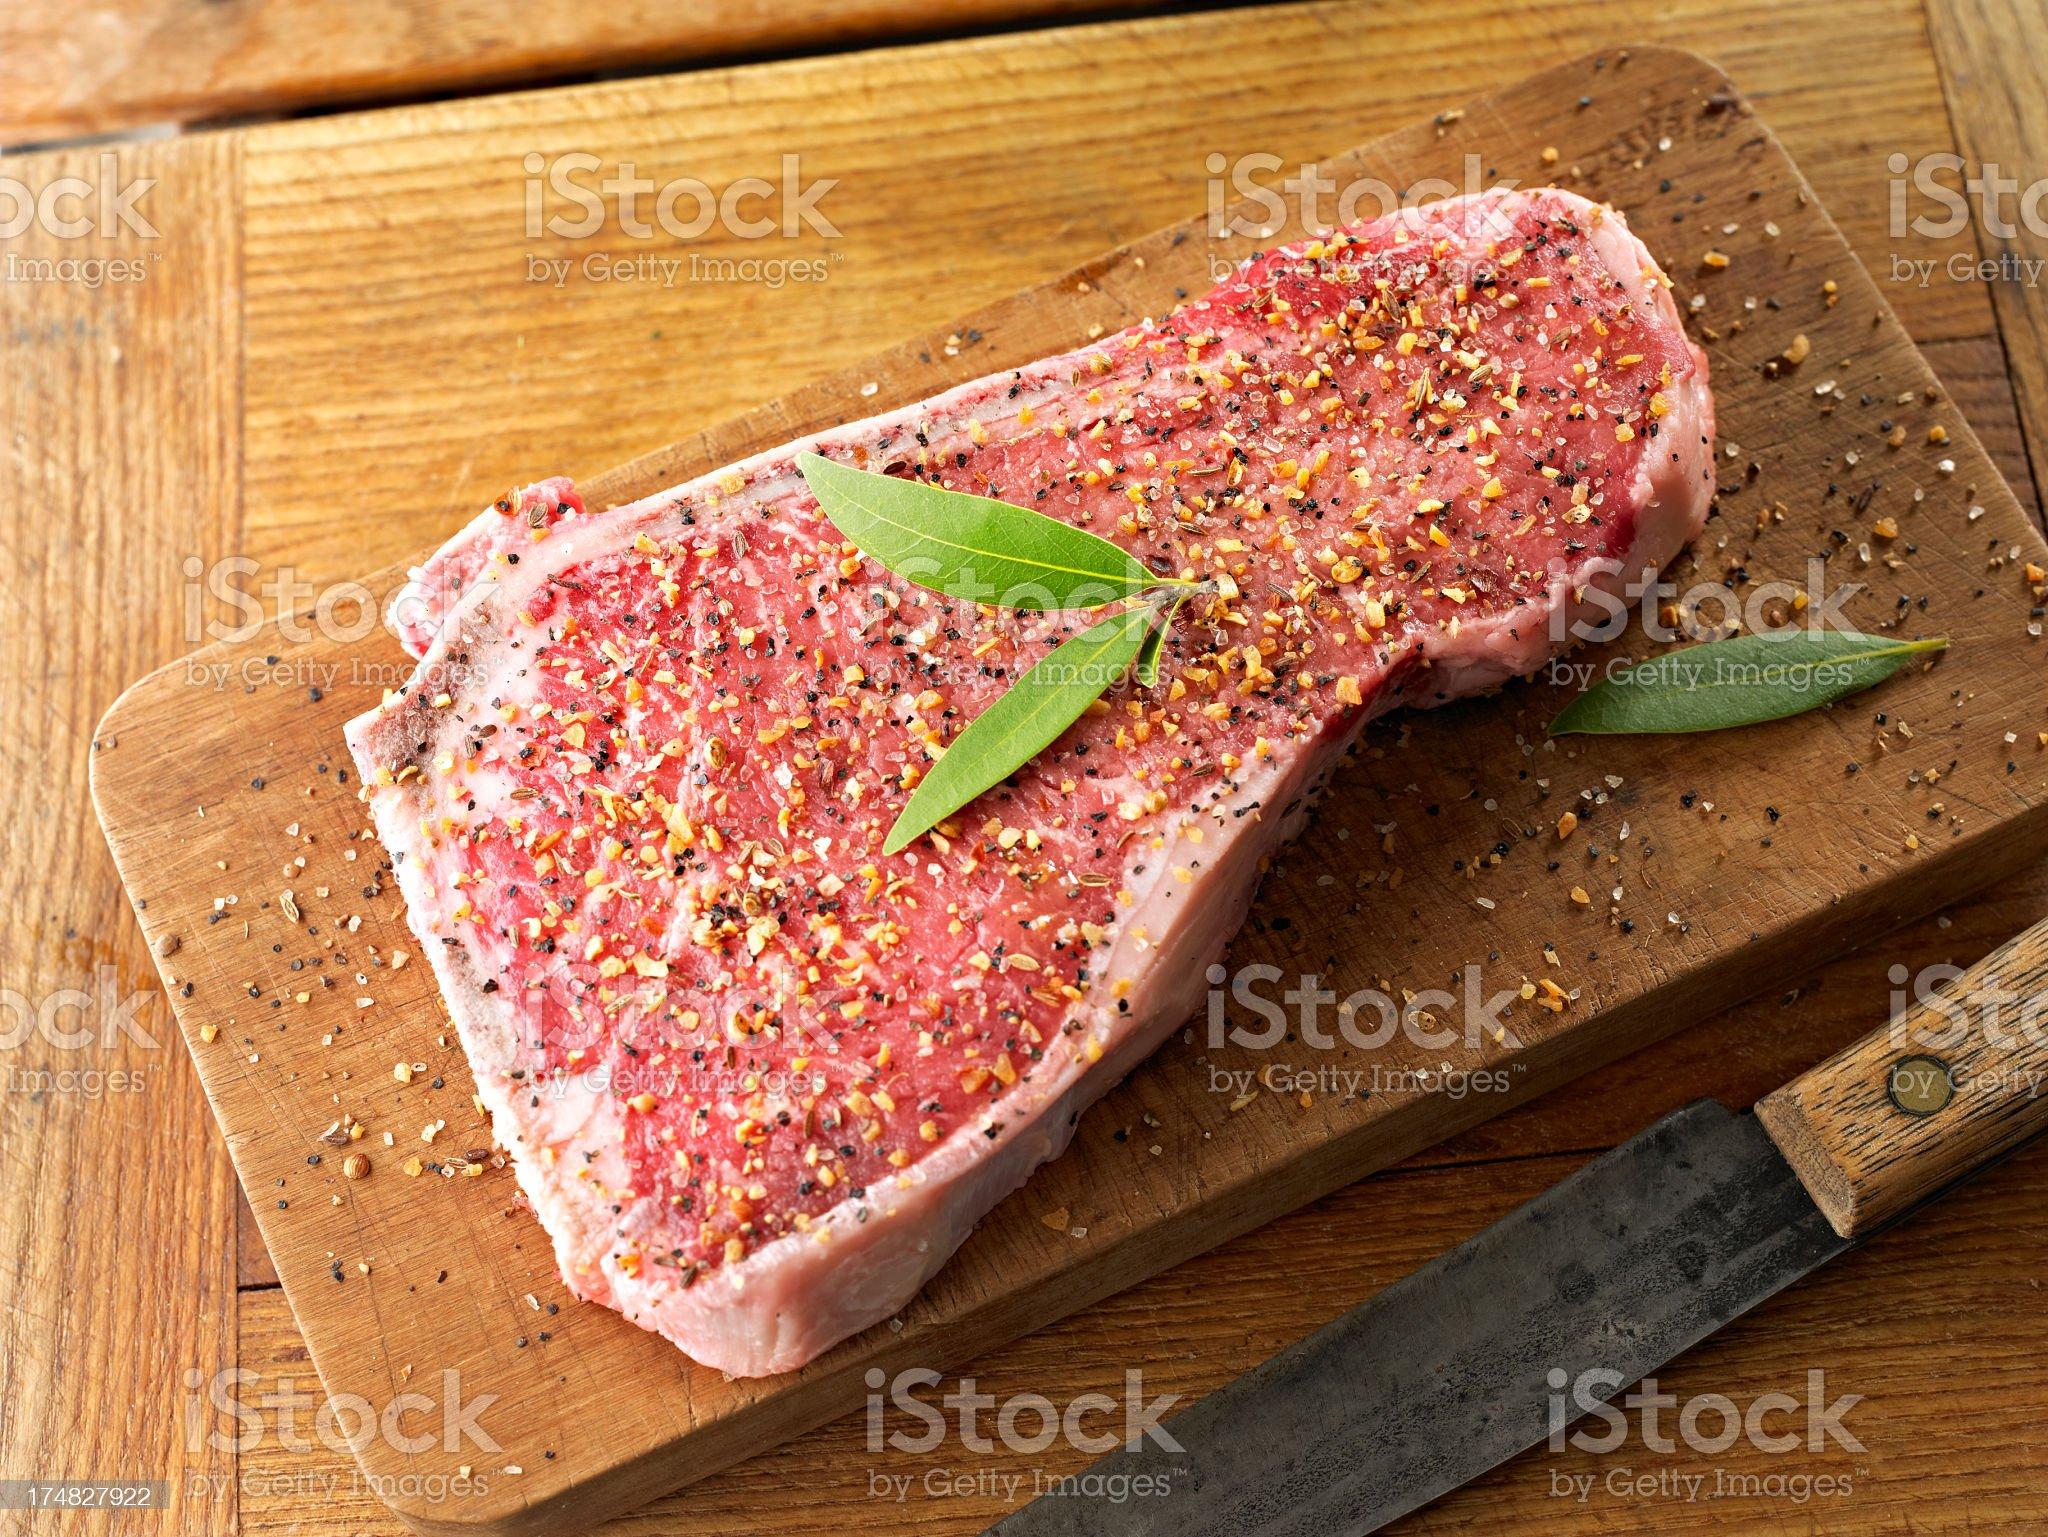 Raw Steak with Seasoning royalty-free stock photo